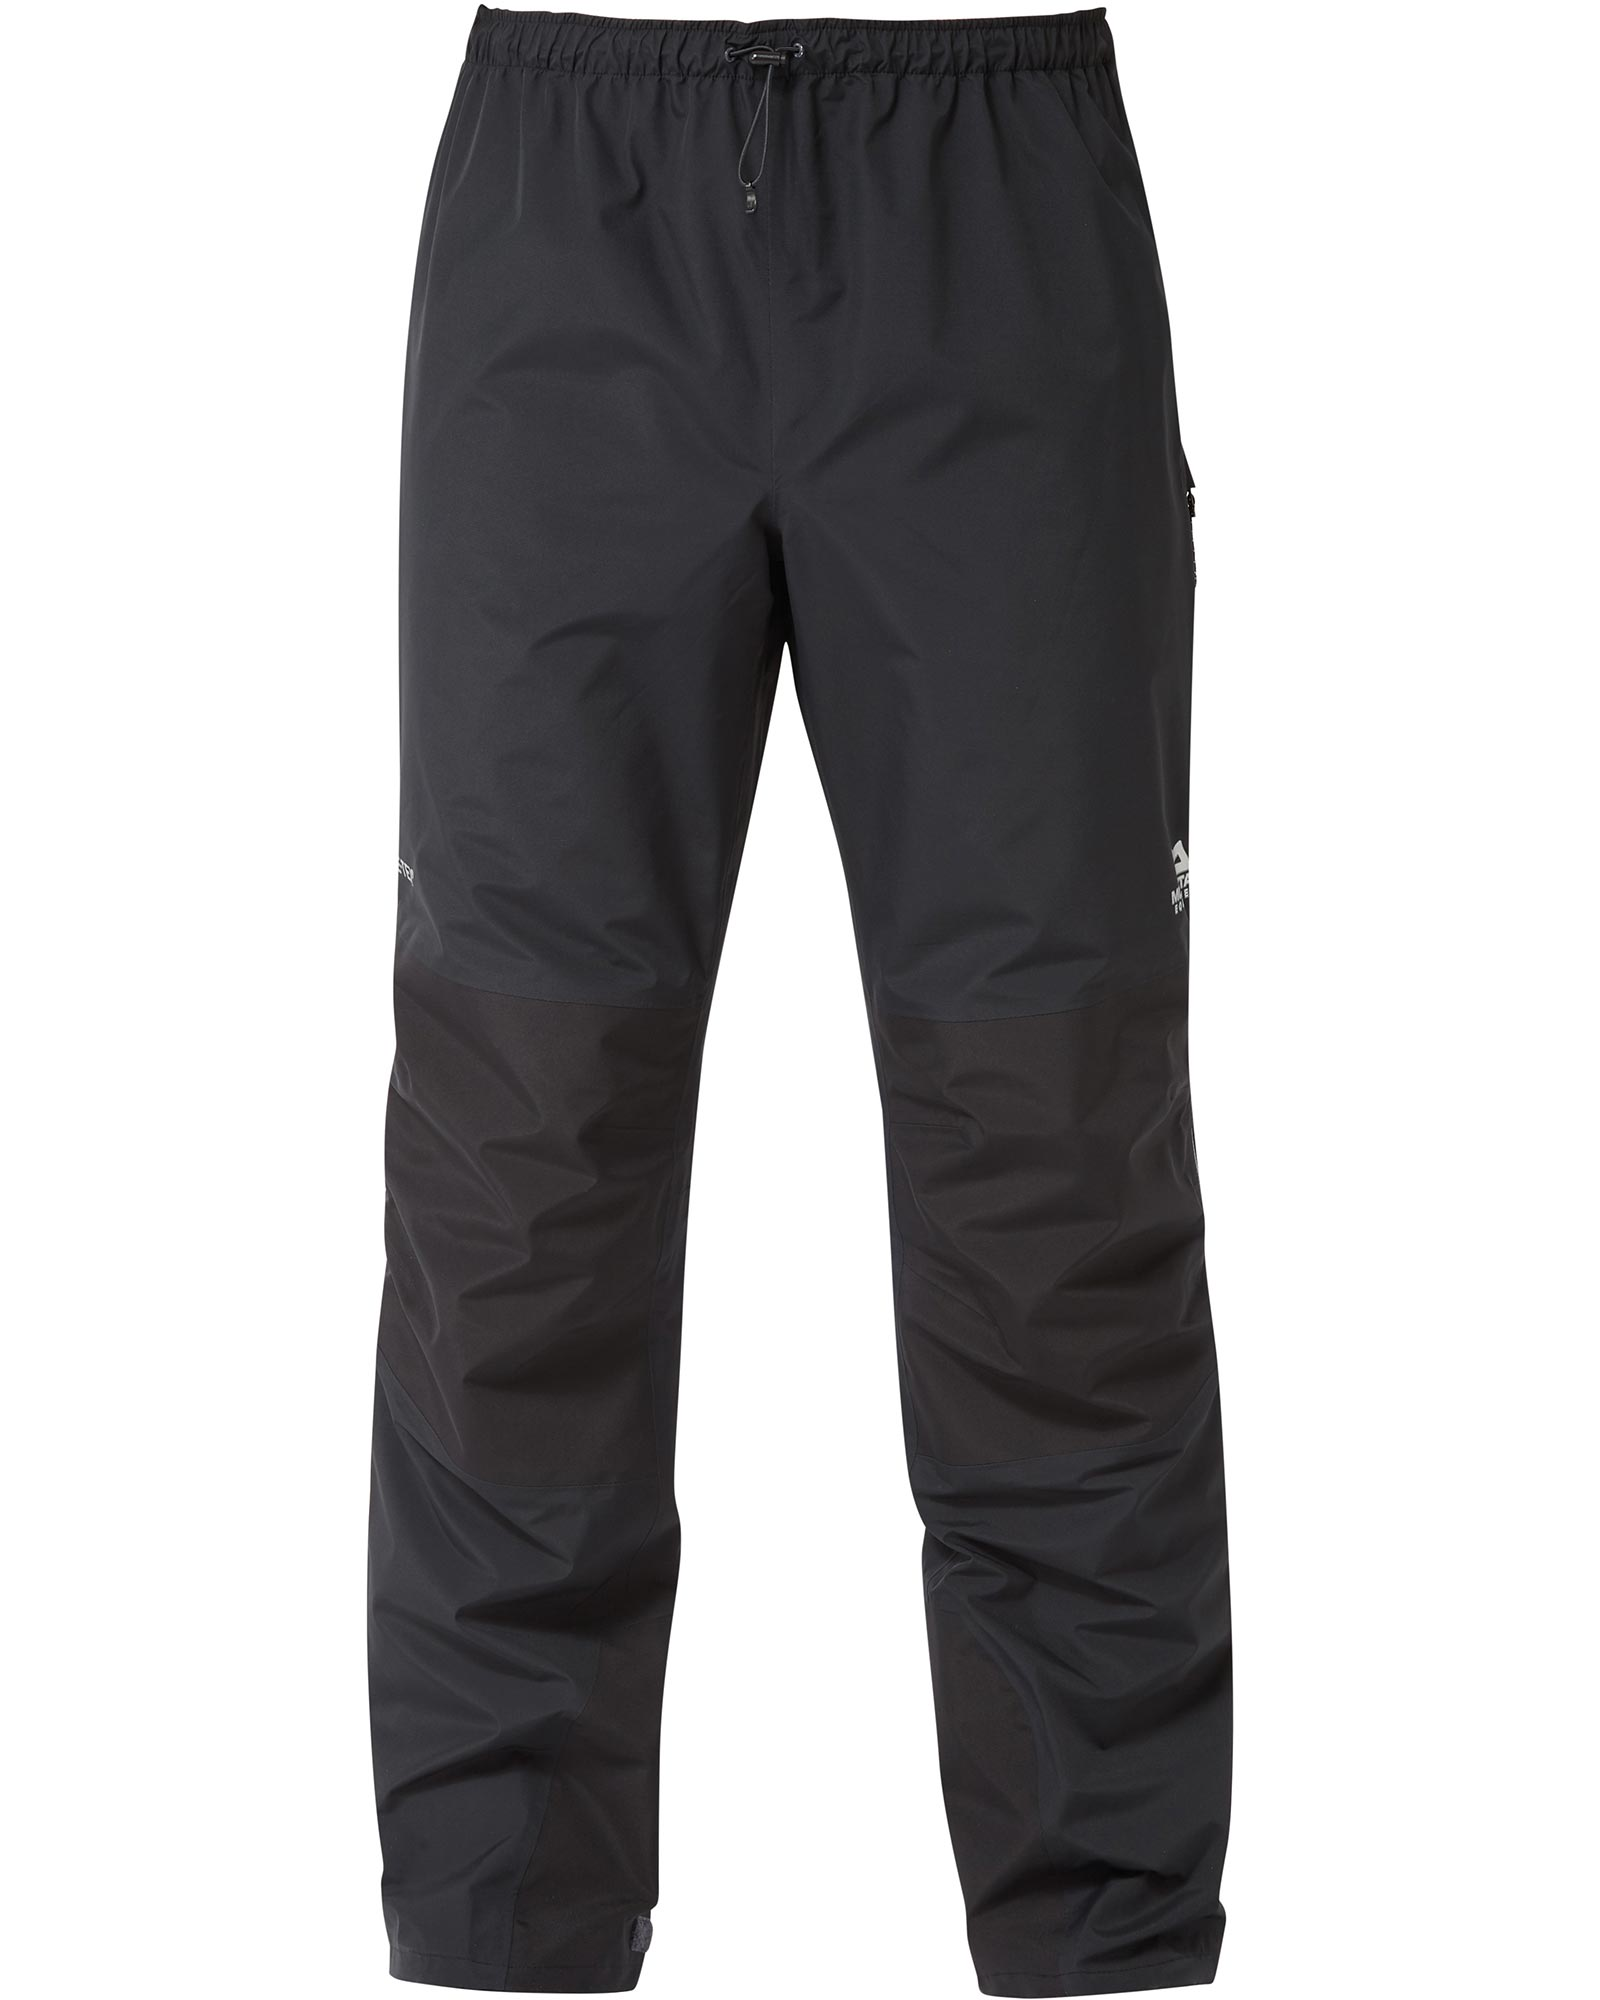 Mountain Equipment Men's Saltoro GORE-TEX PACLITE Plus Pants Black 0